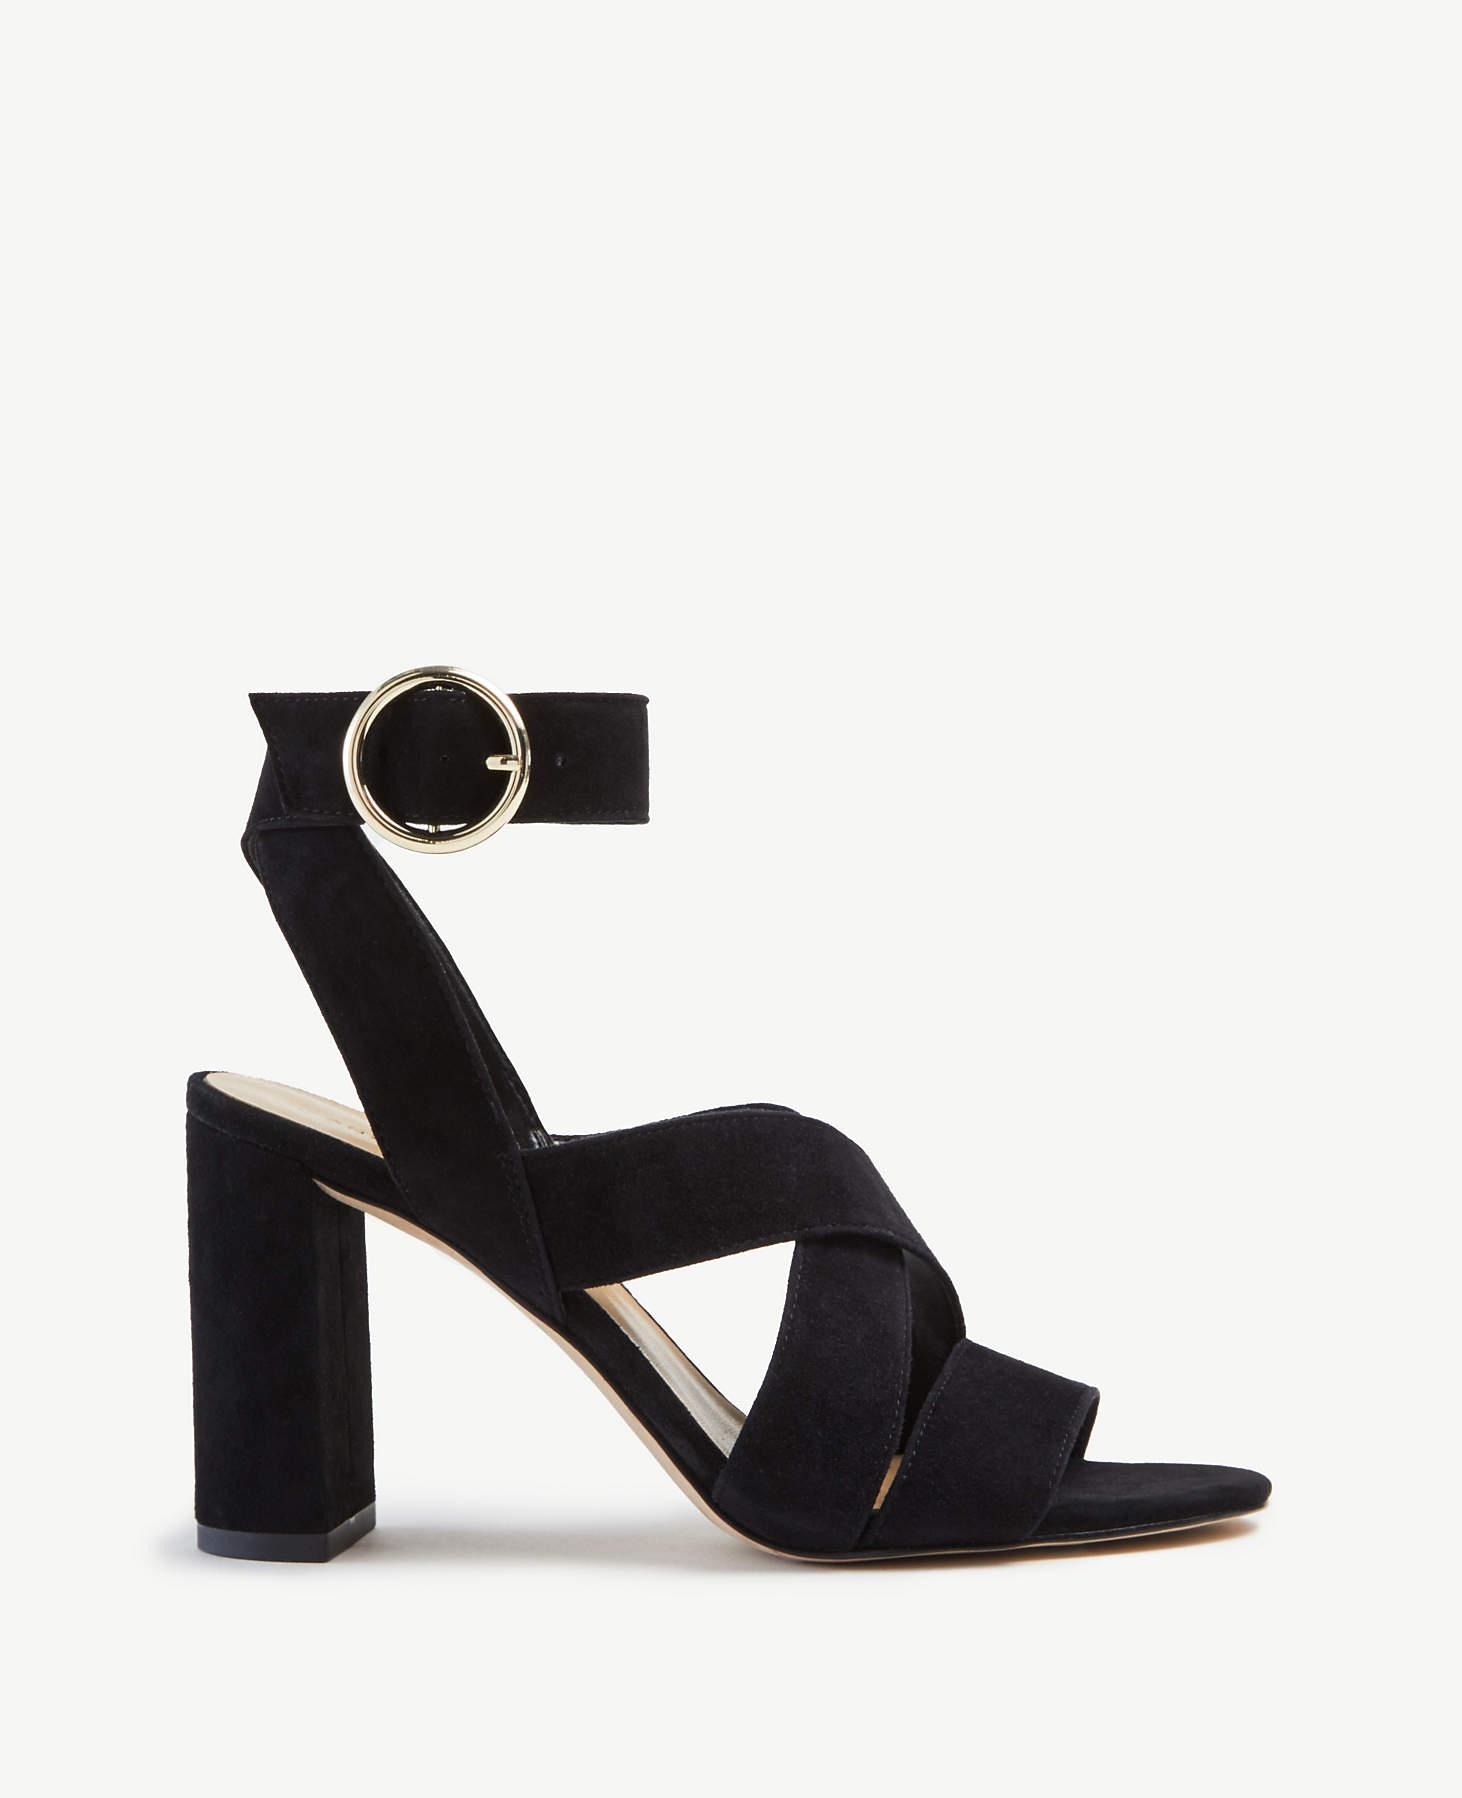 KEREE Womens High Heel Wedge Sandals Open Toe Slip On Embroidered Rose Flower Chunky Platform Slide Sandal